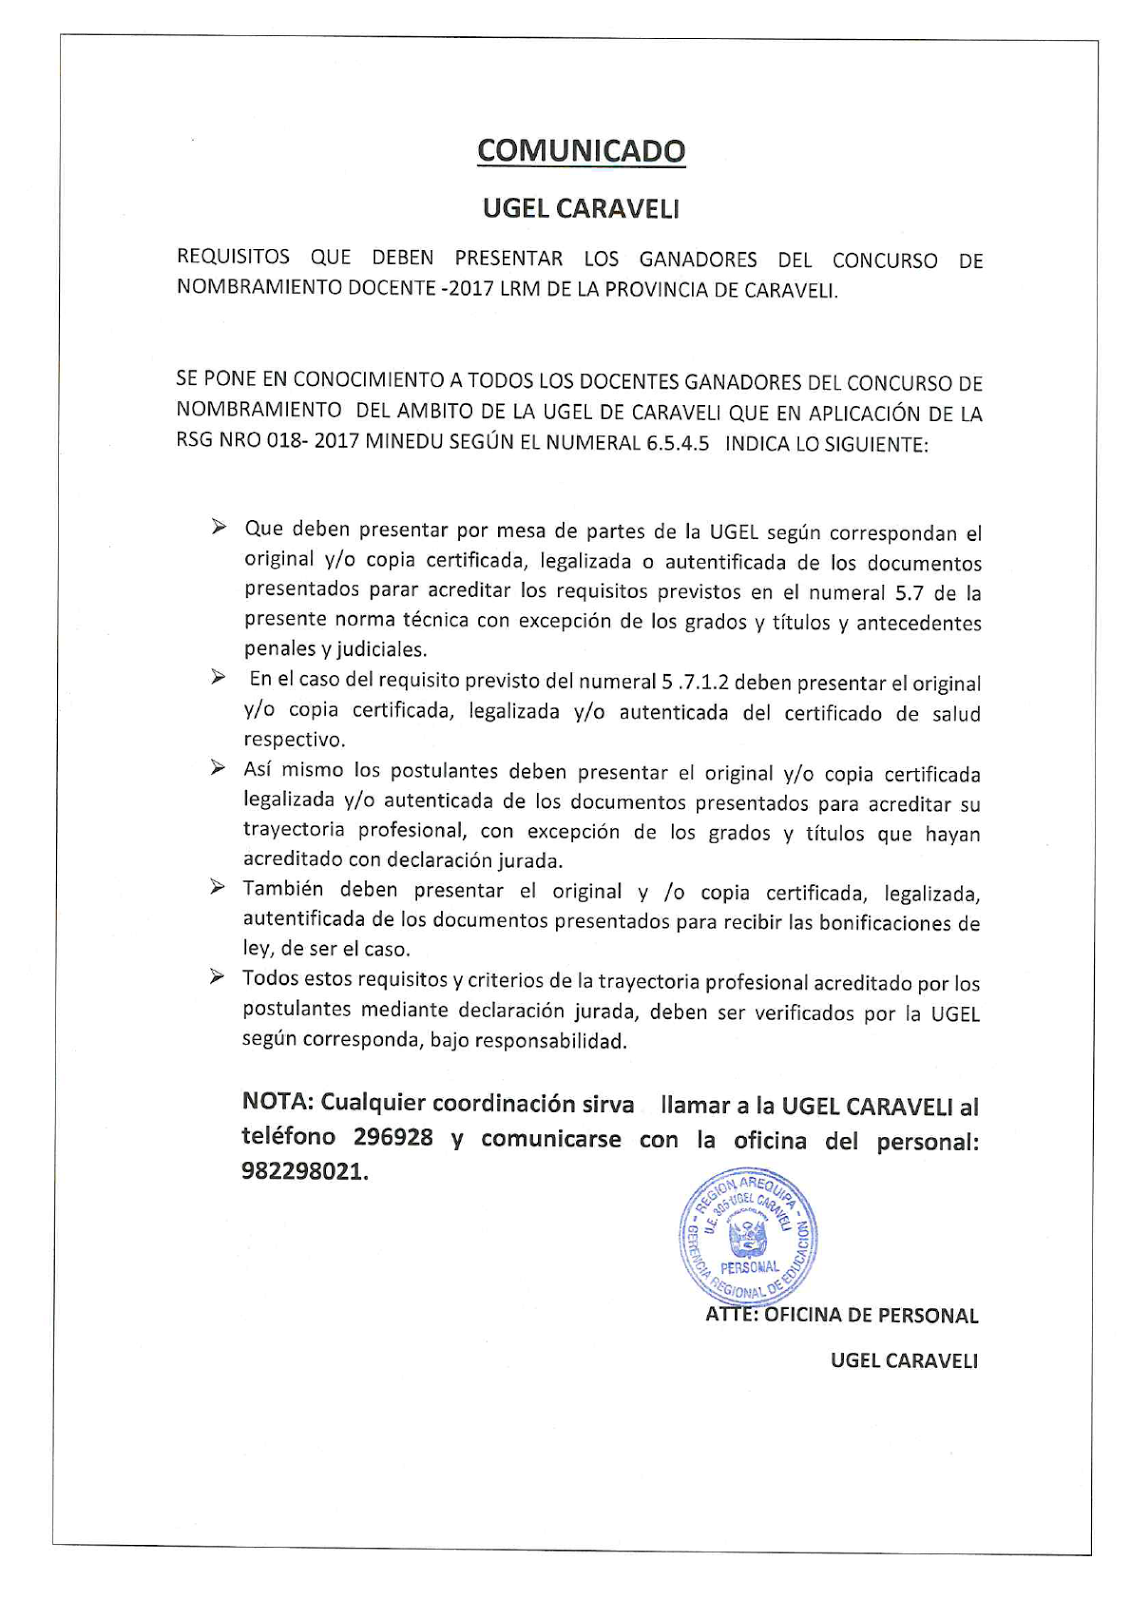 Comunicado ugel caraveli requisitos que deben presentar for Concurso docente 2017